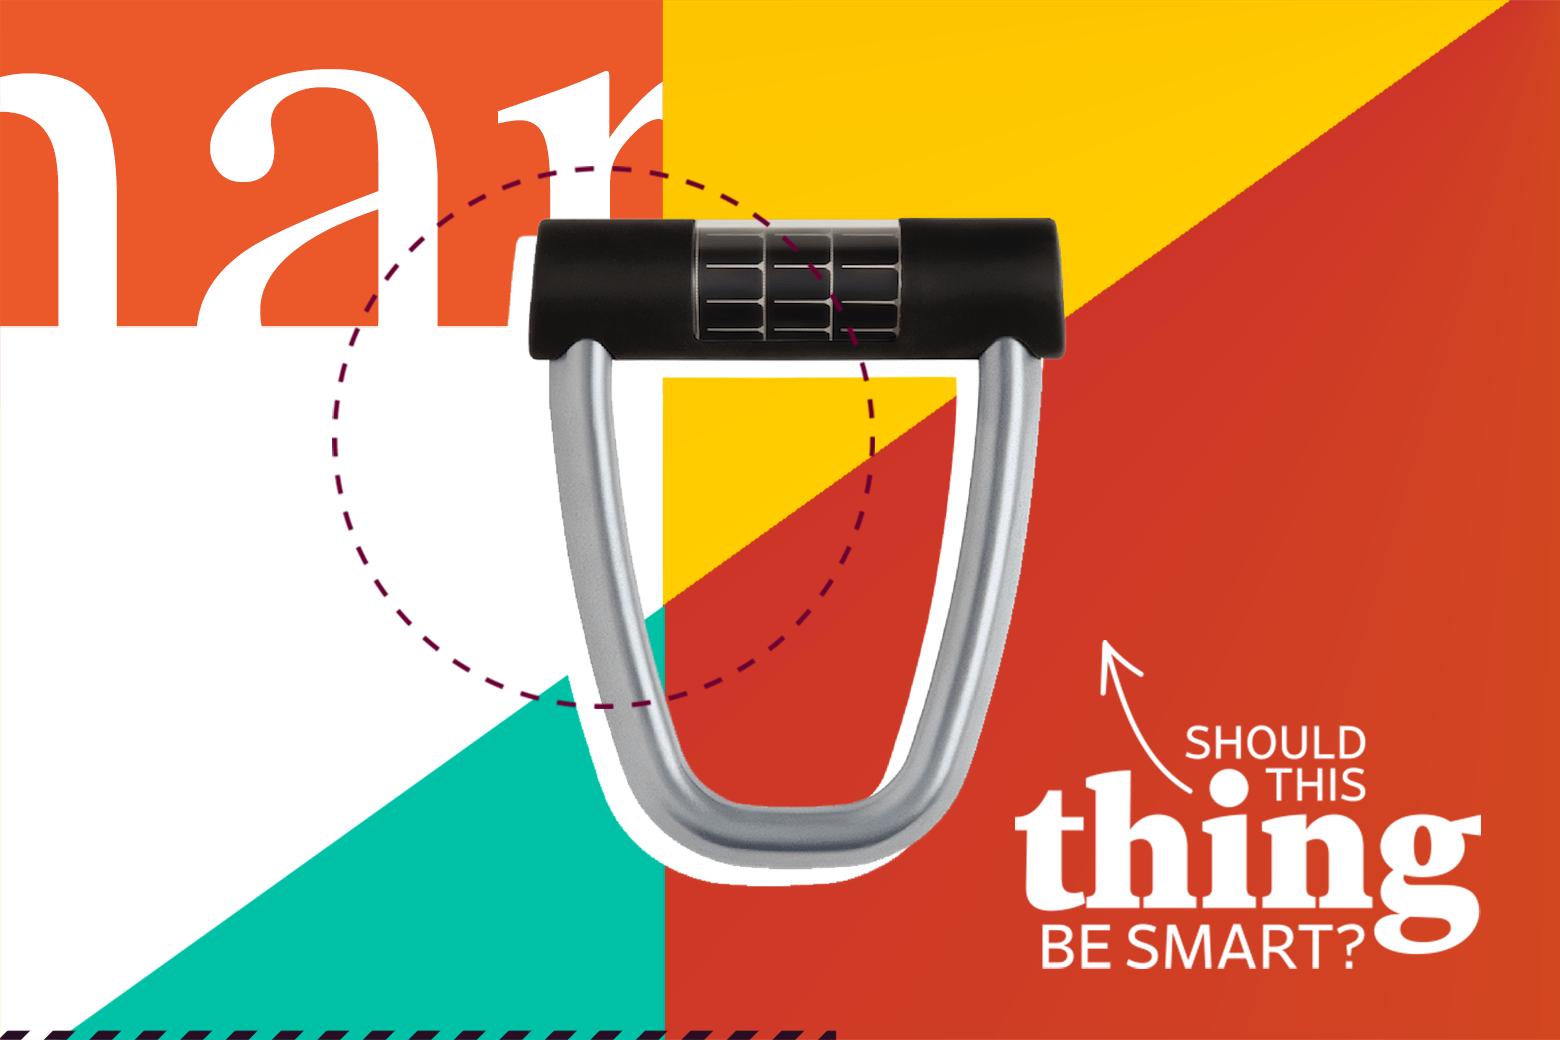 The Ellipse smart bike lock by Lattis.